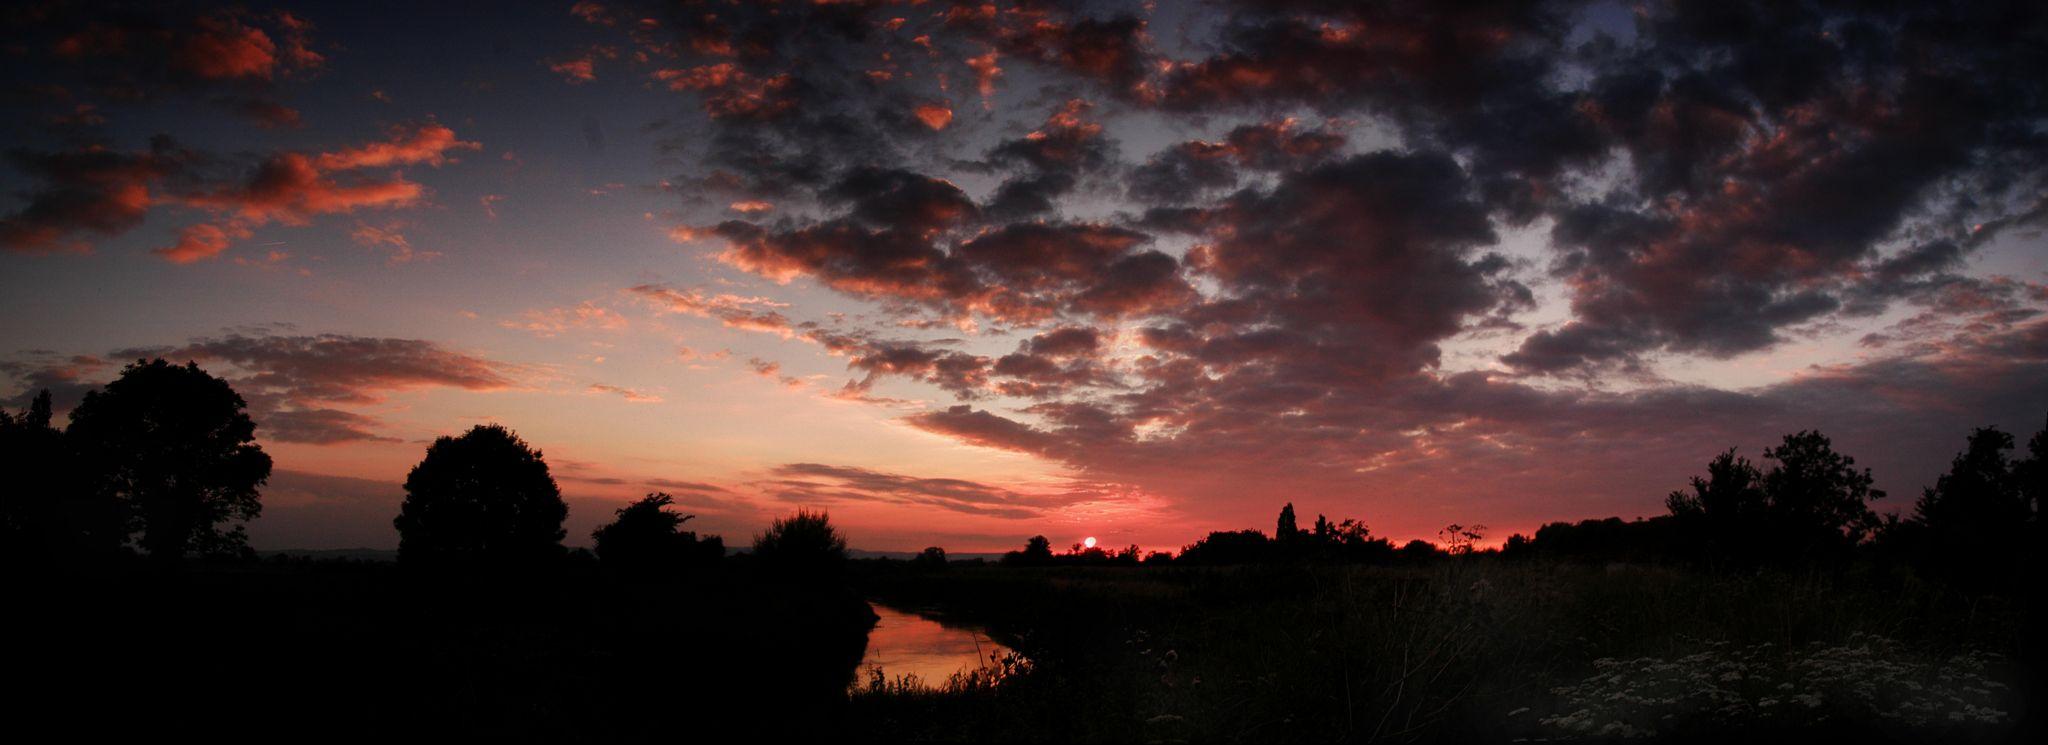 River Parrett, United Kingdom